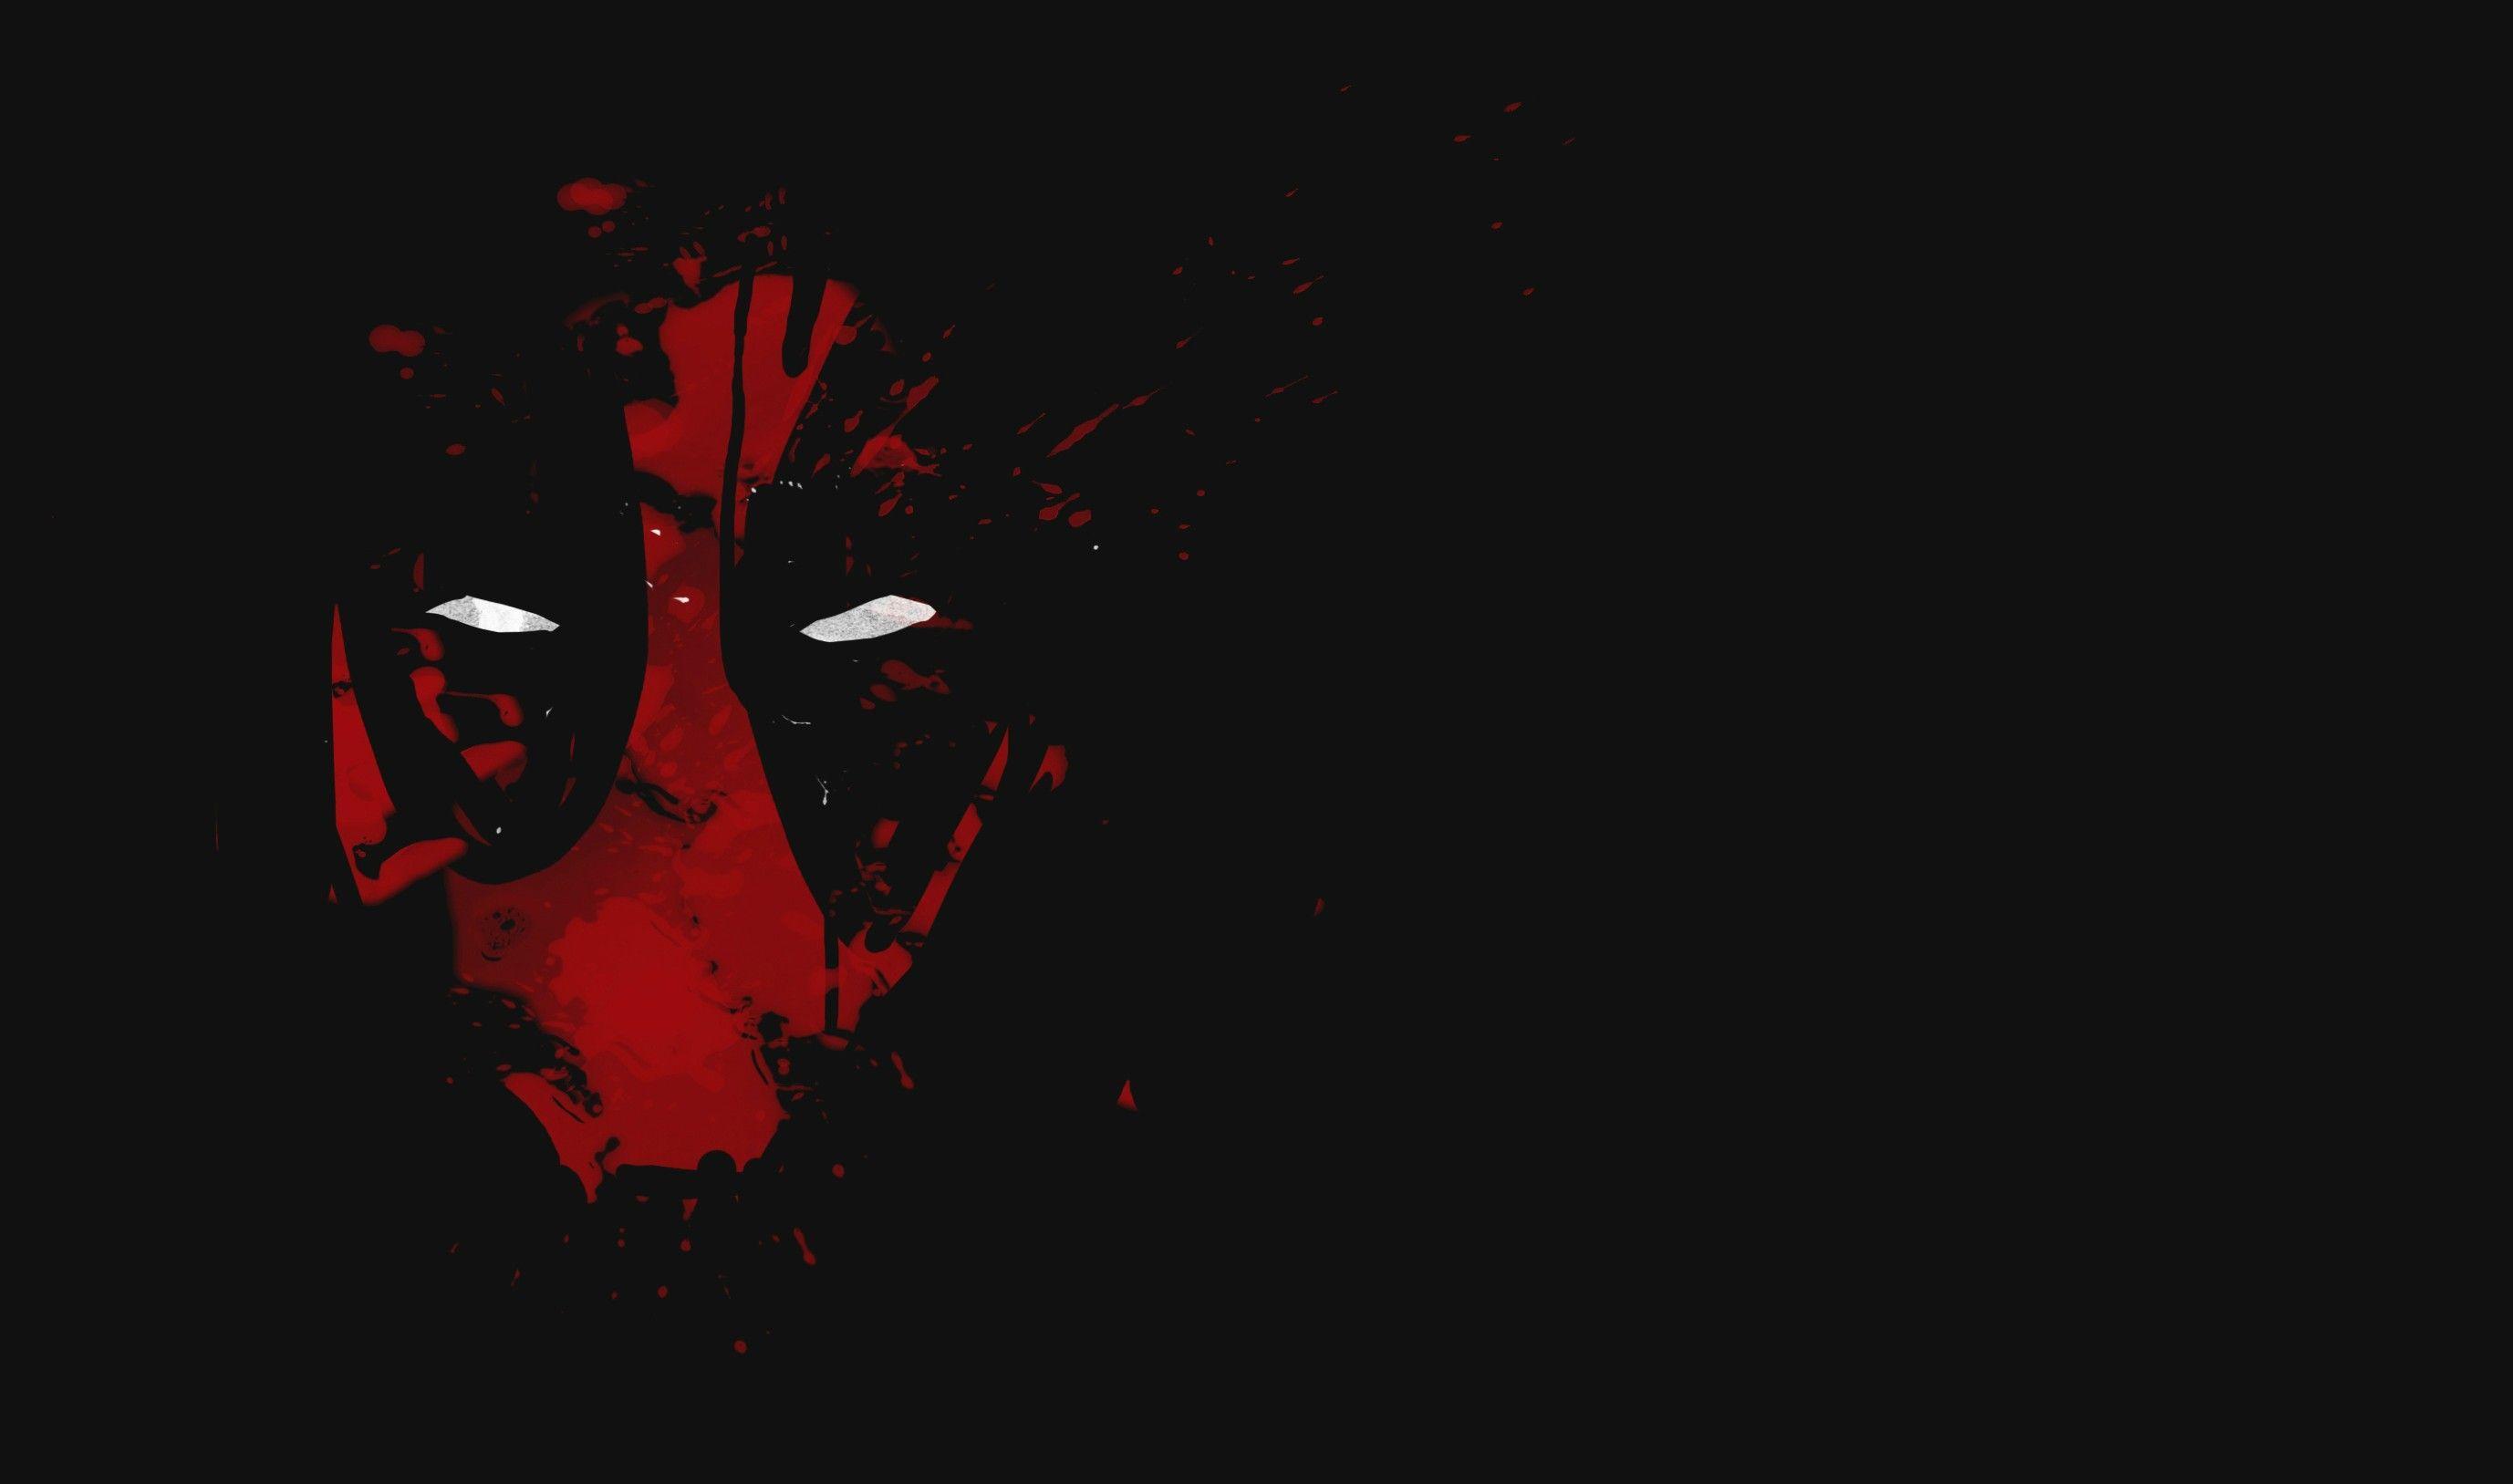 Black Deadpool Wallpapers Top Free Black Deadpool Backgrounds Wallpaperaccess